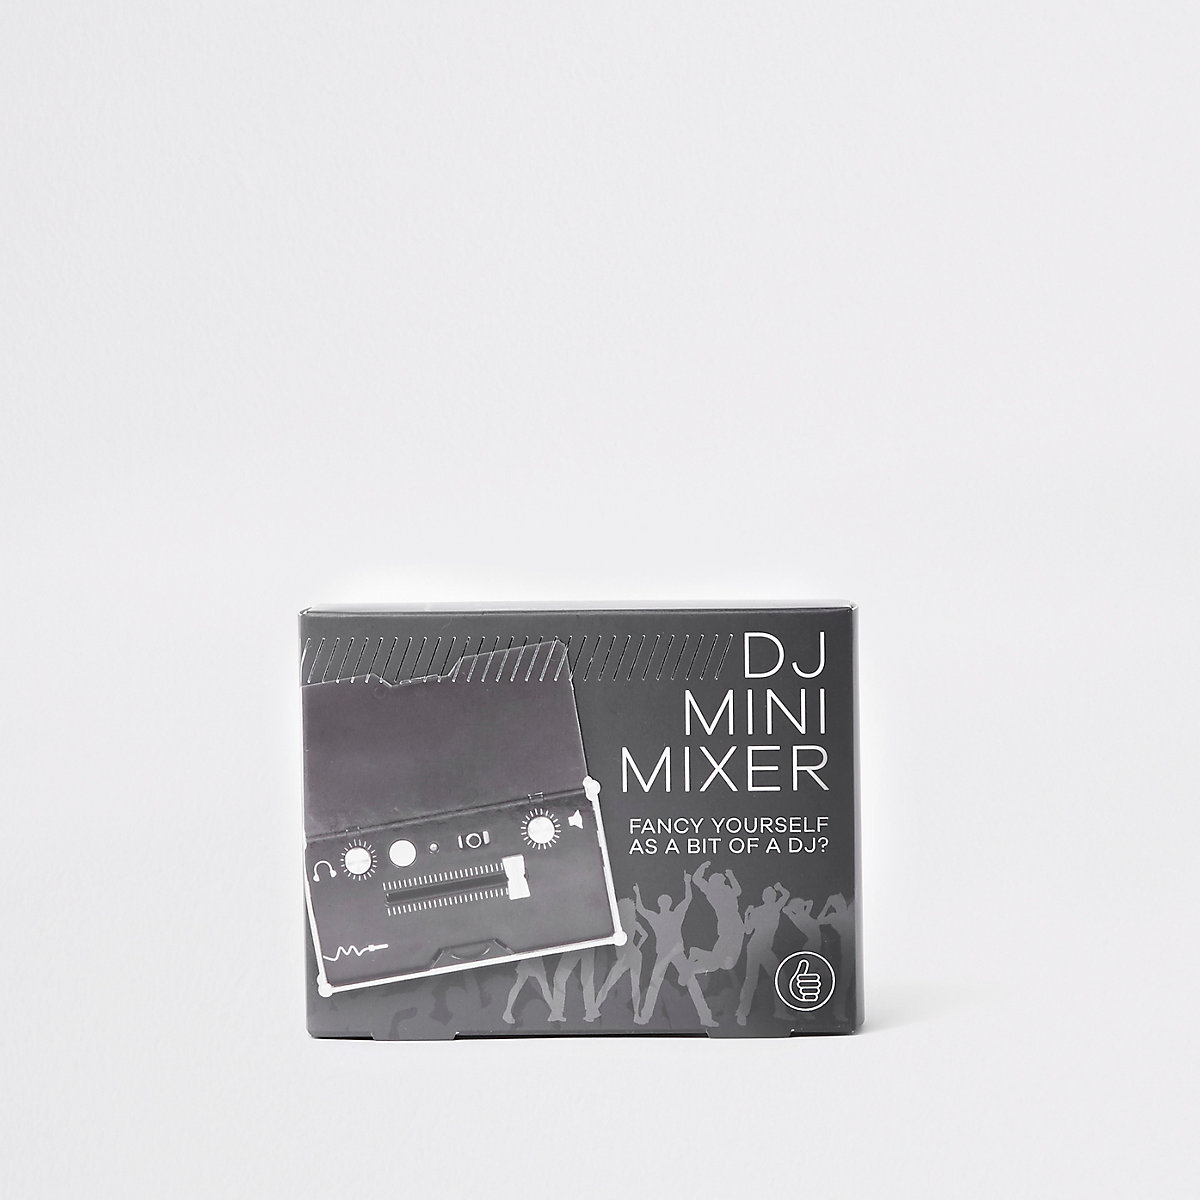 DJ mini mixer